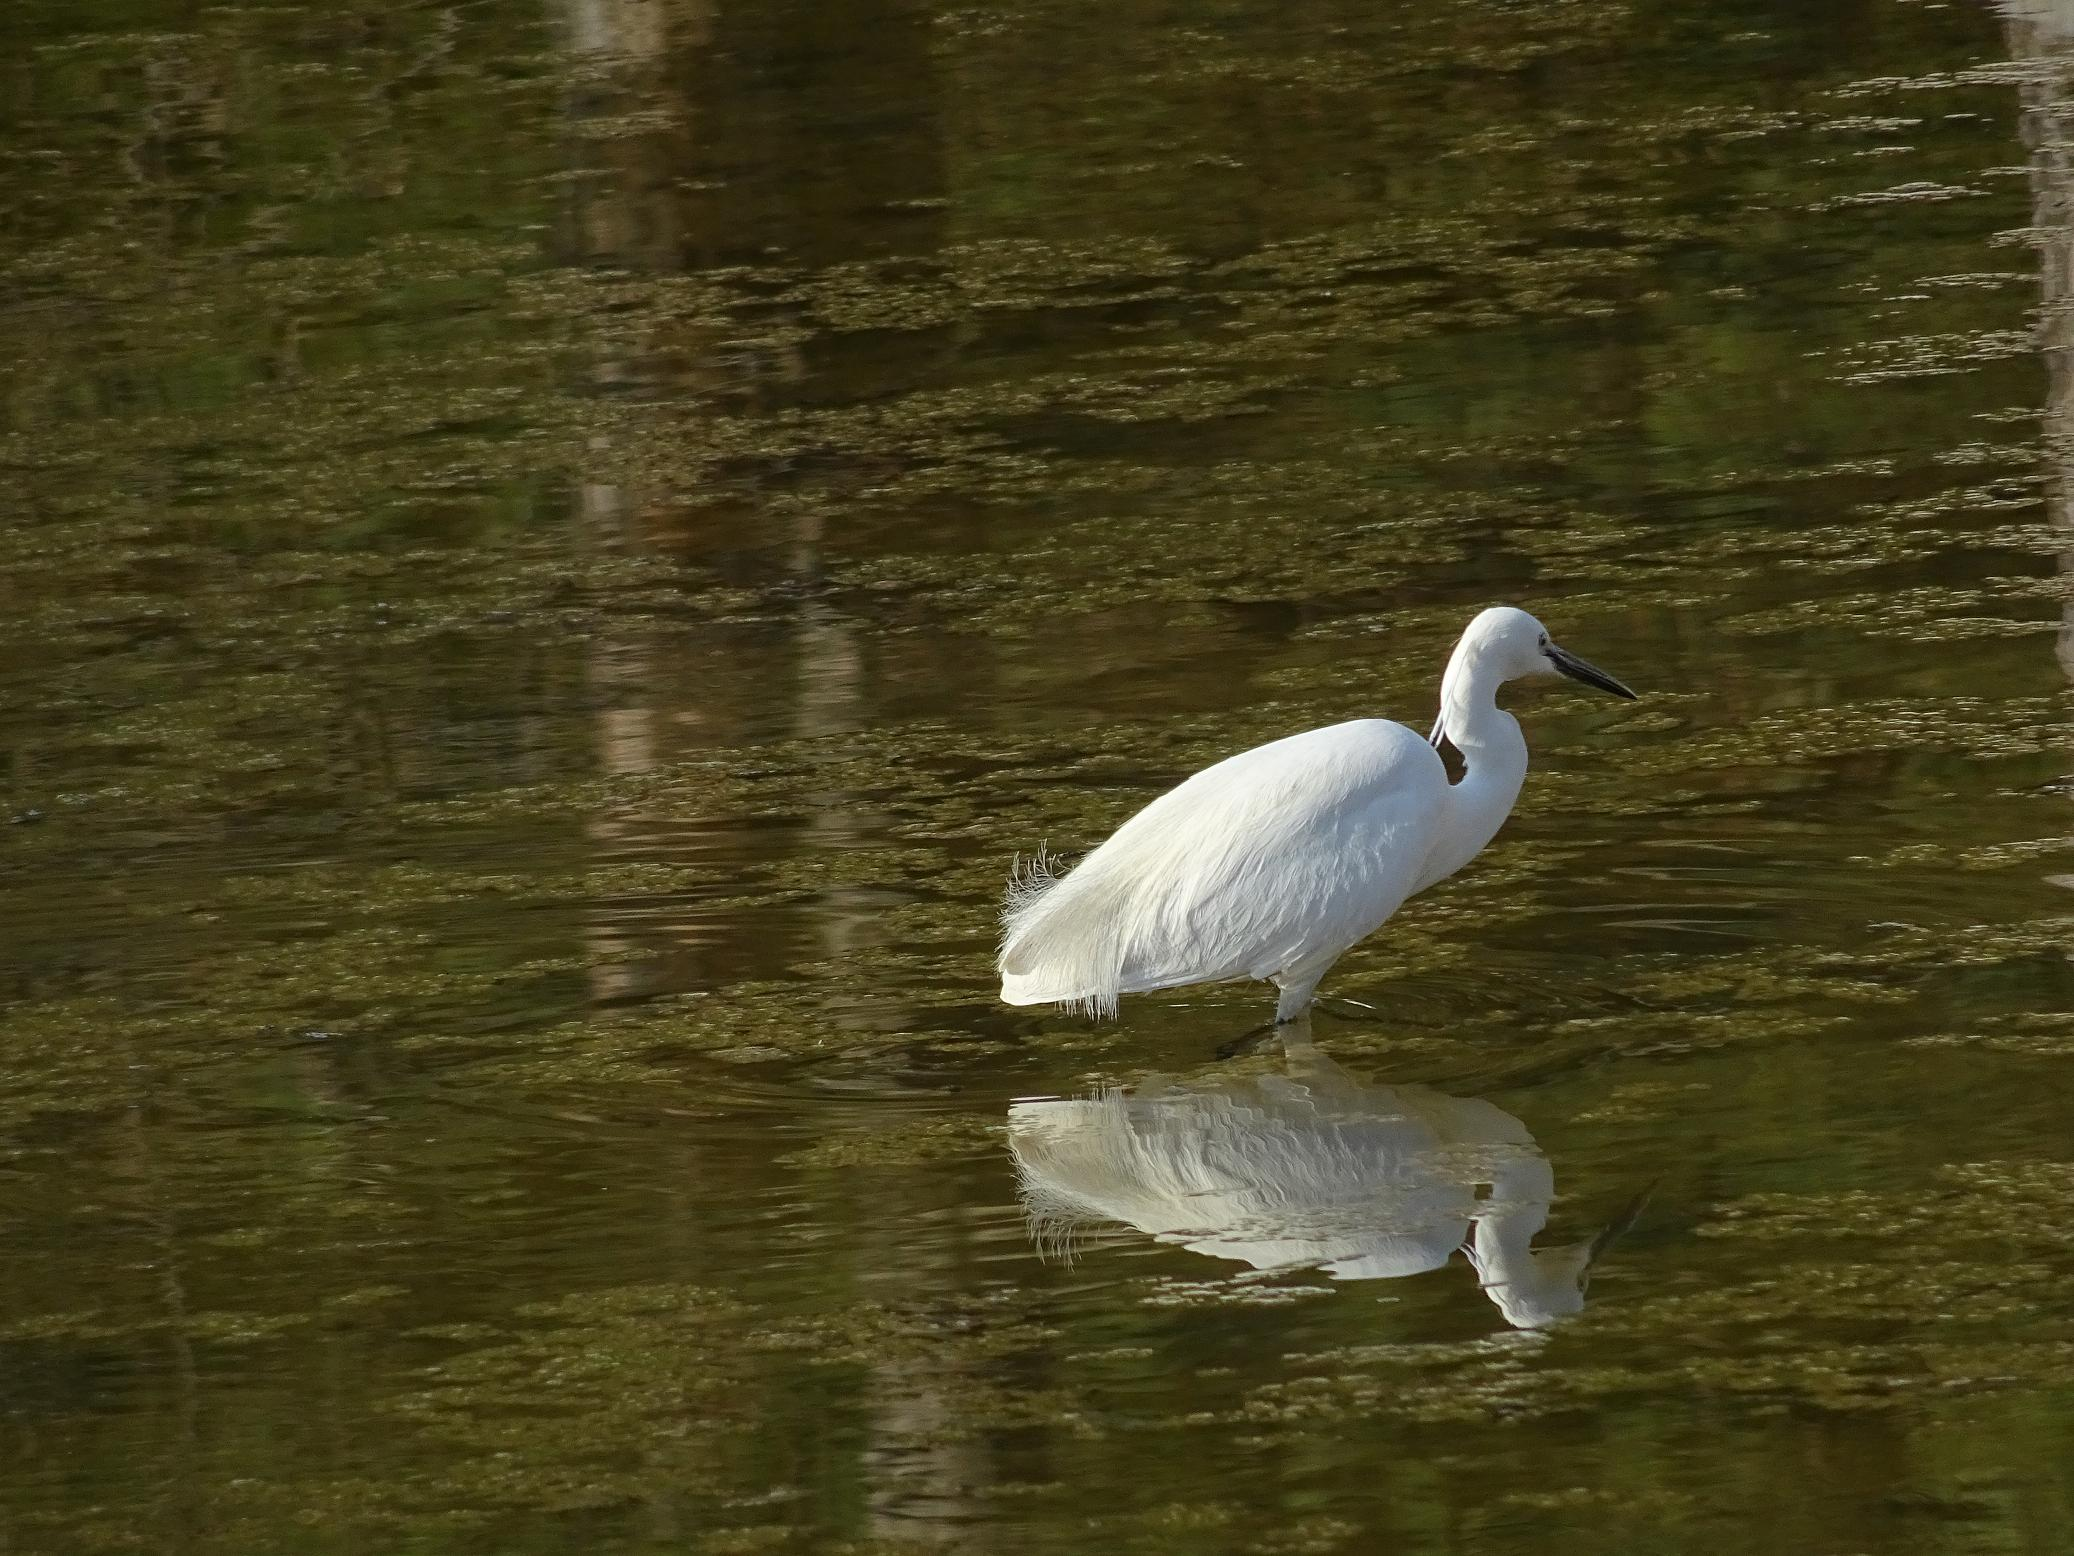 Малая белая цапля (Egretta garzetta) Автор: Кирилова Любовь